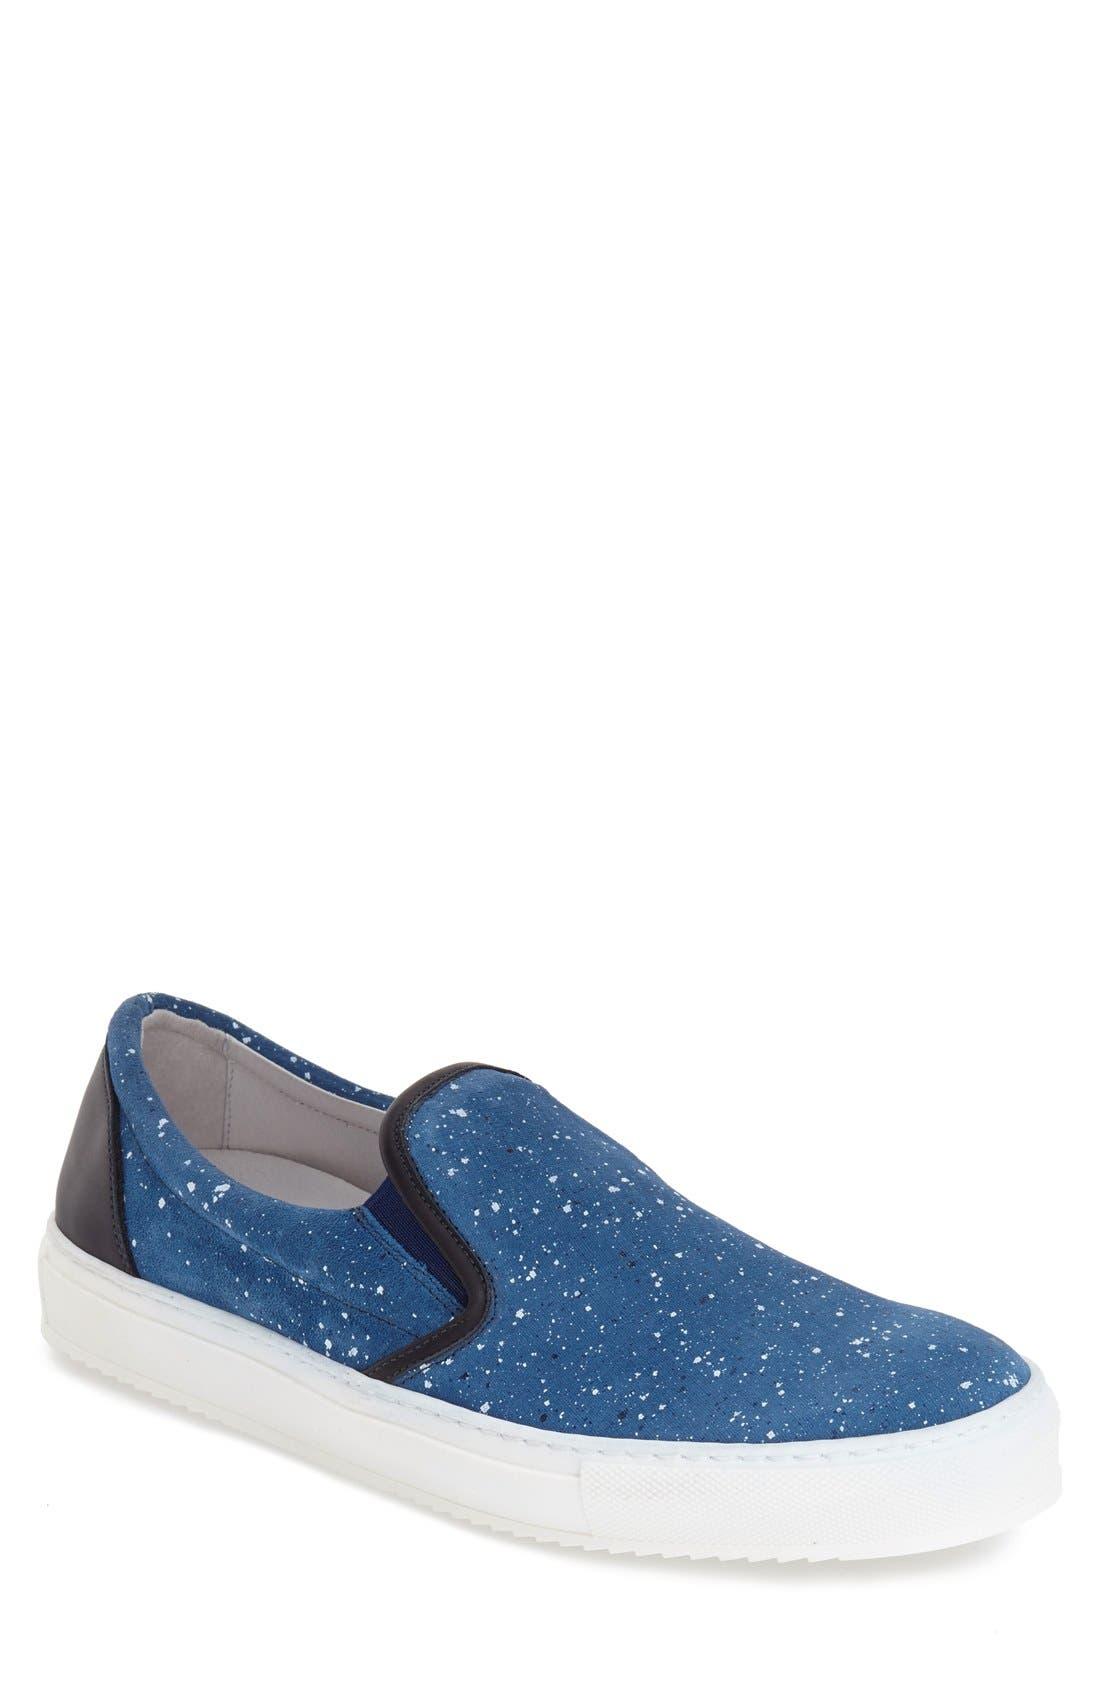 Santorini Slip-On Sneaker,                             Main thumbnail 4, color,